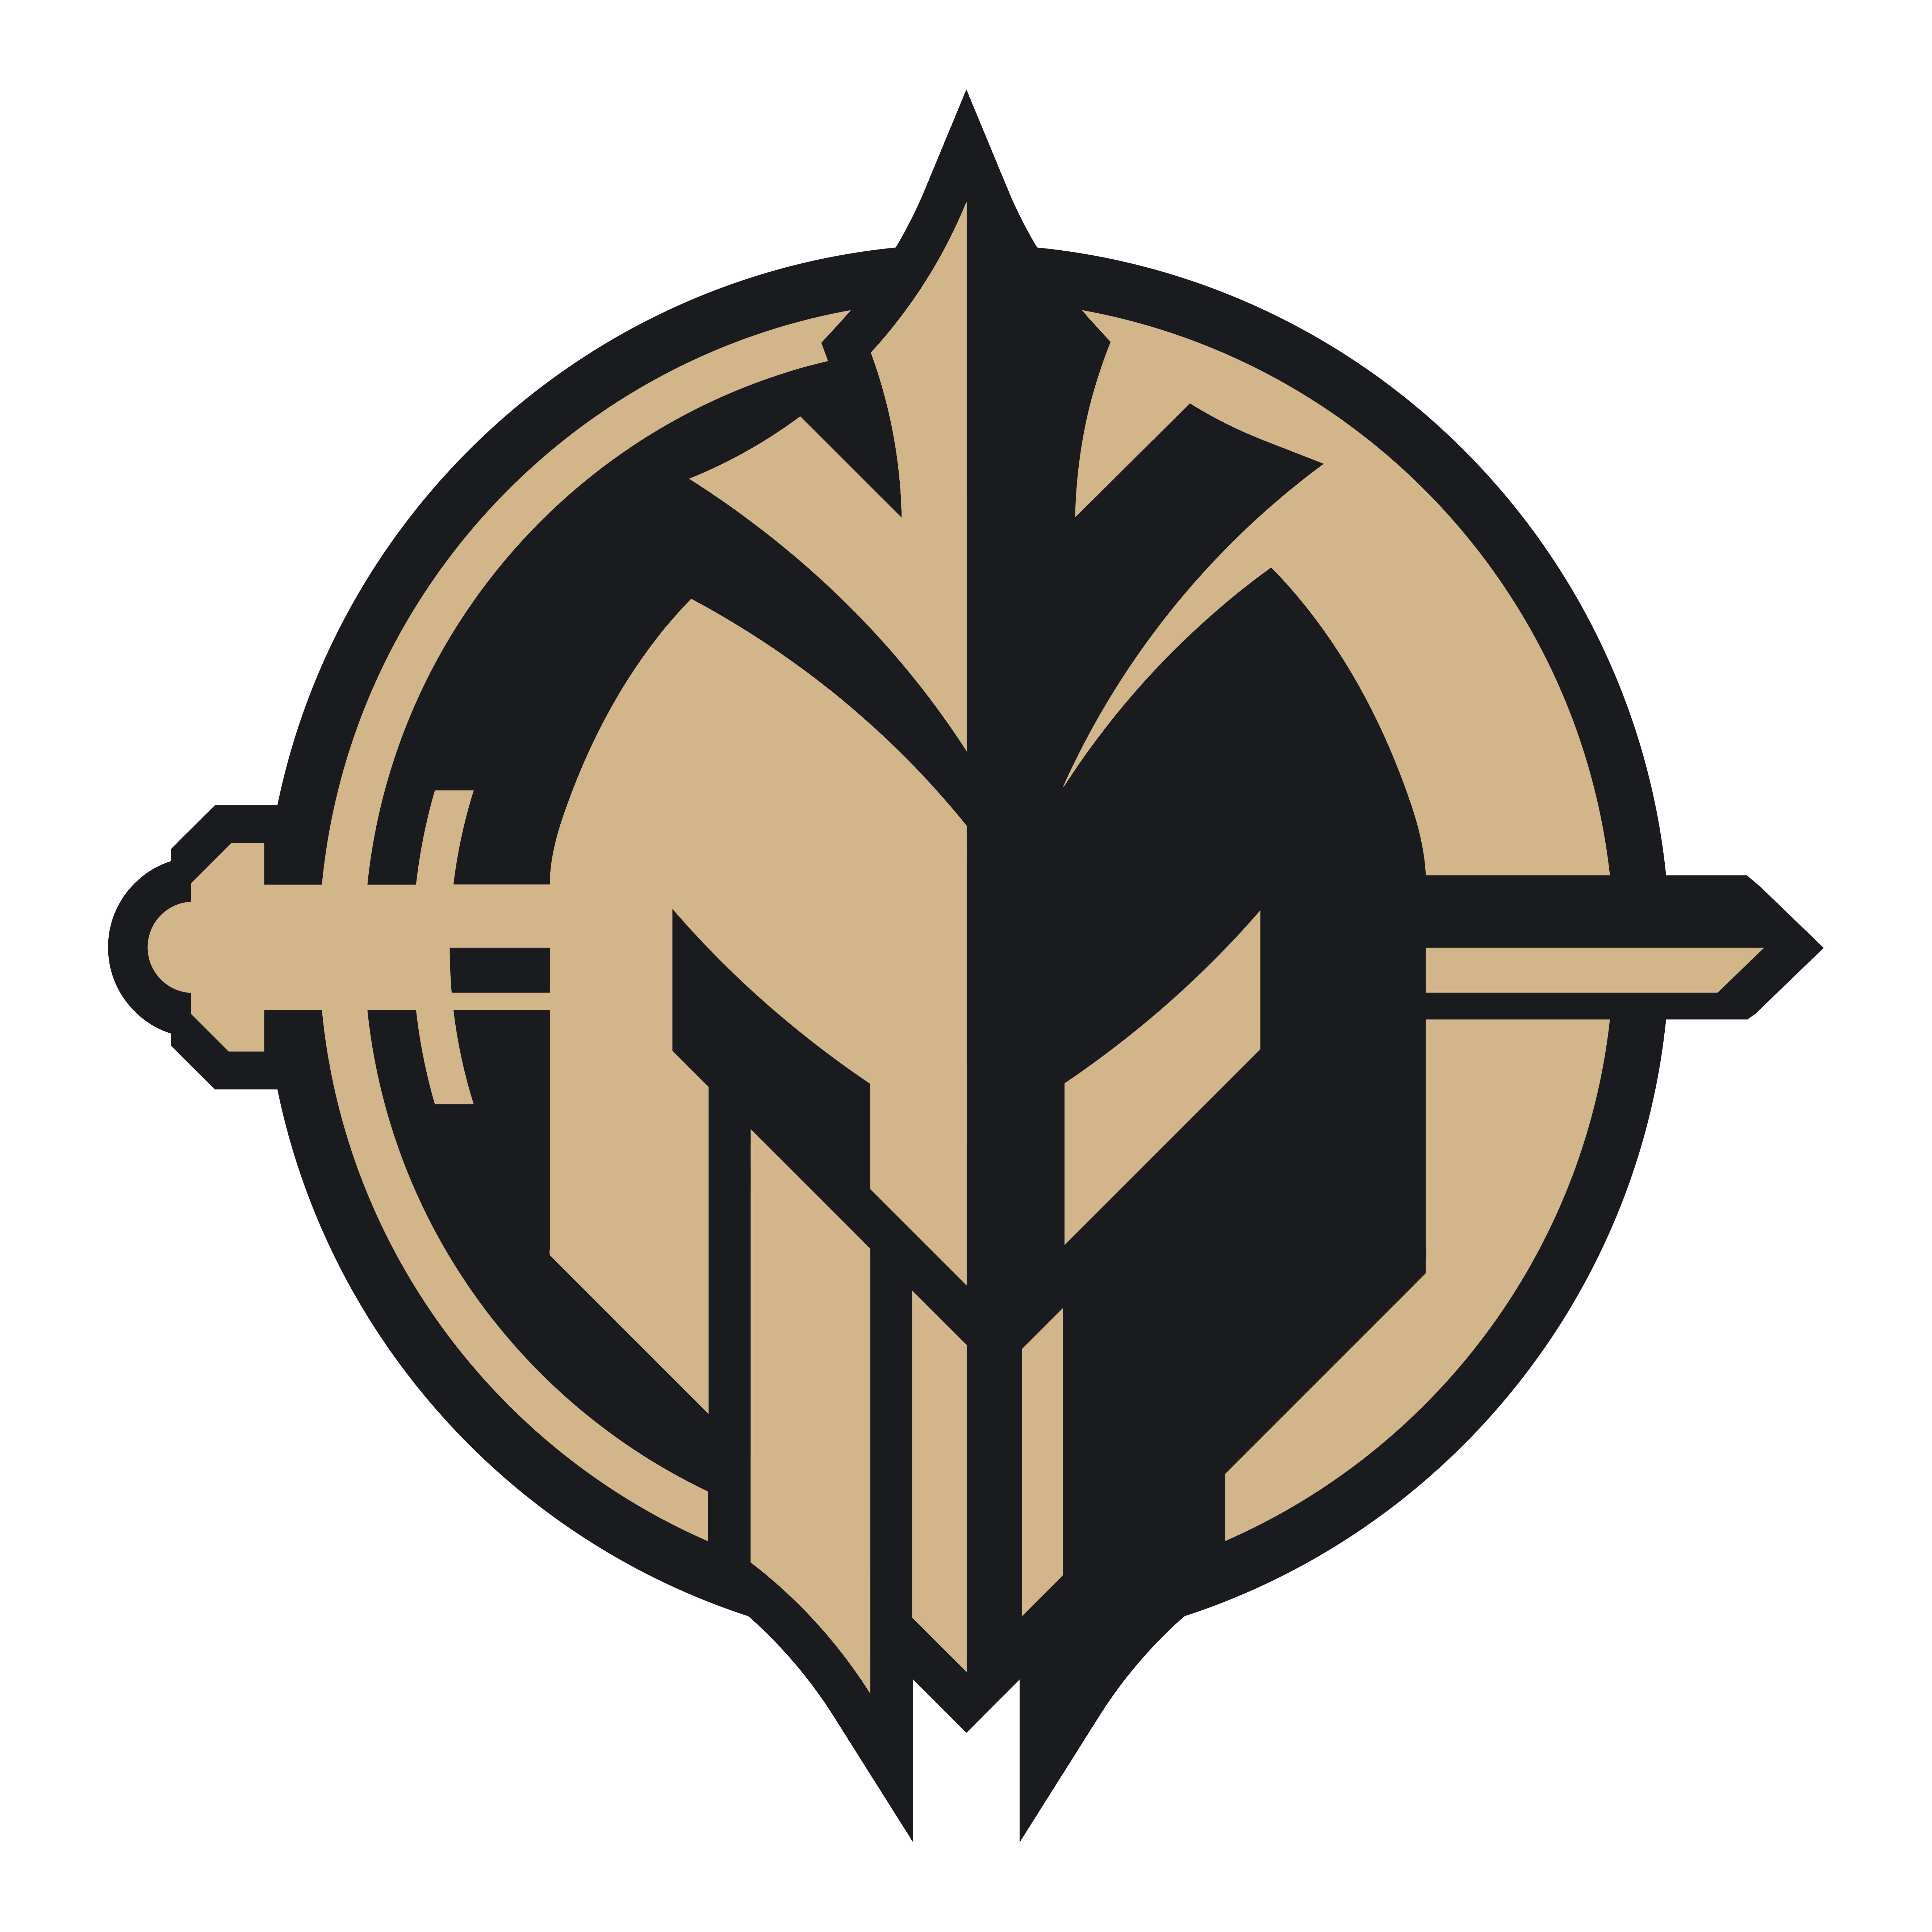 The U S Army S 68th Cssb Black Knights Logo Design Visual Design Blackest Knight